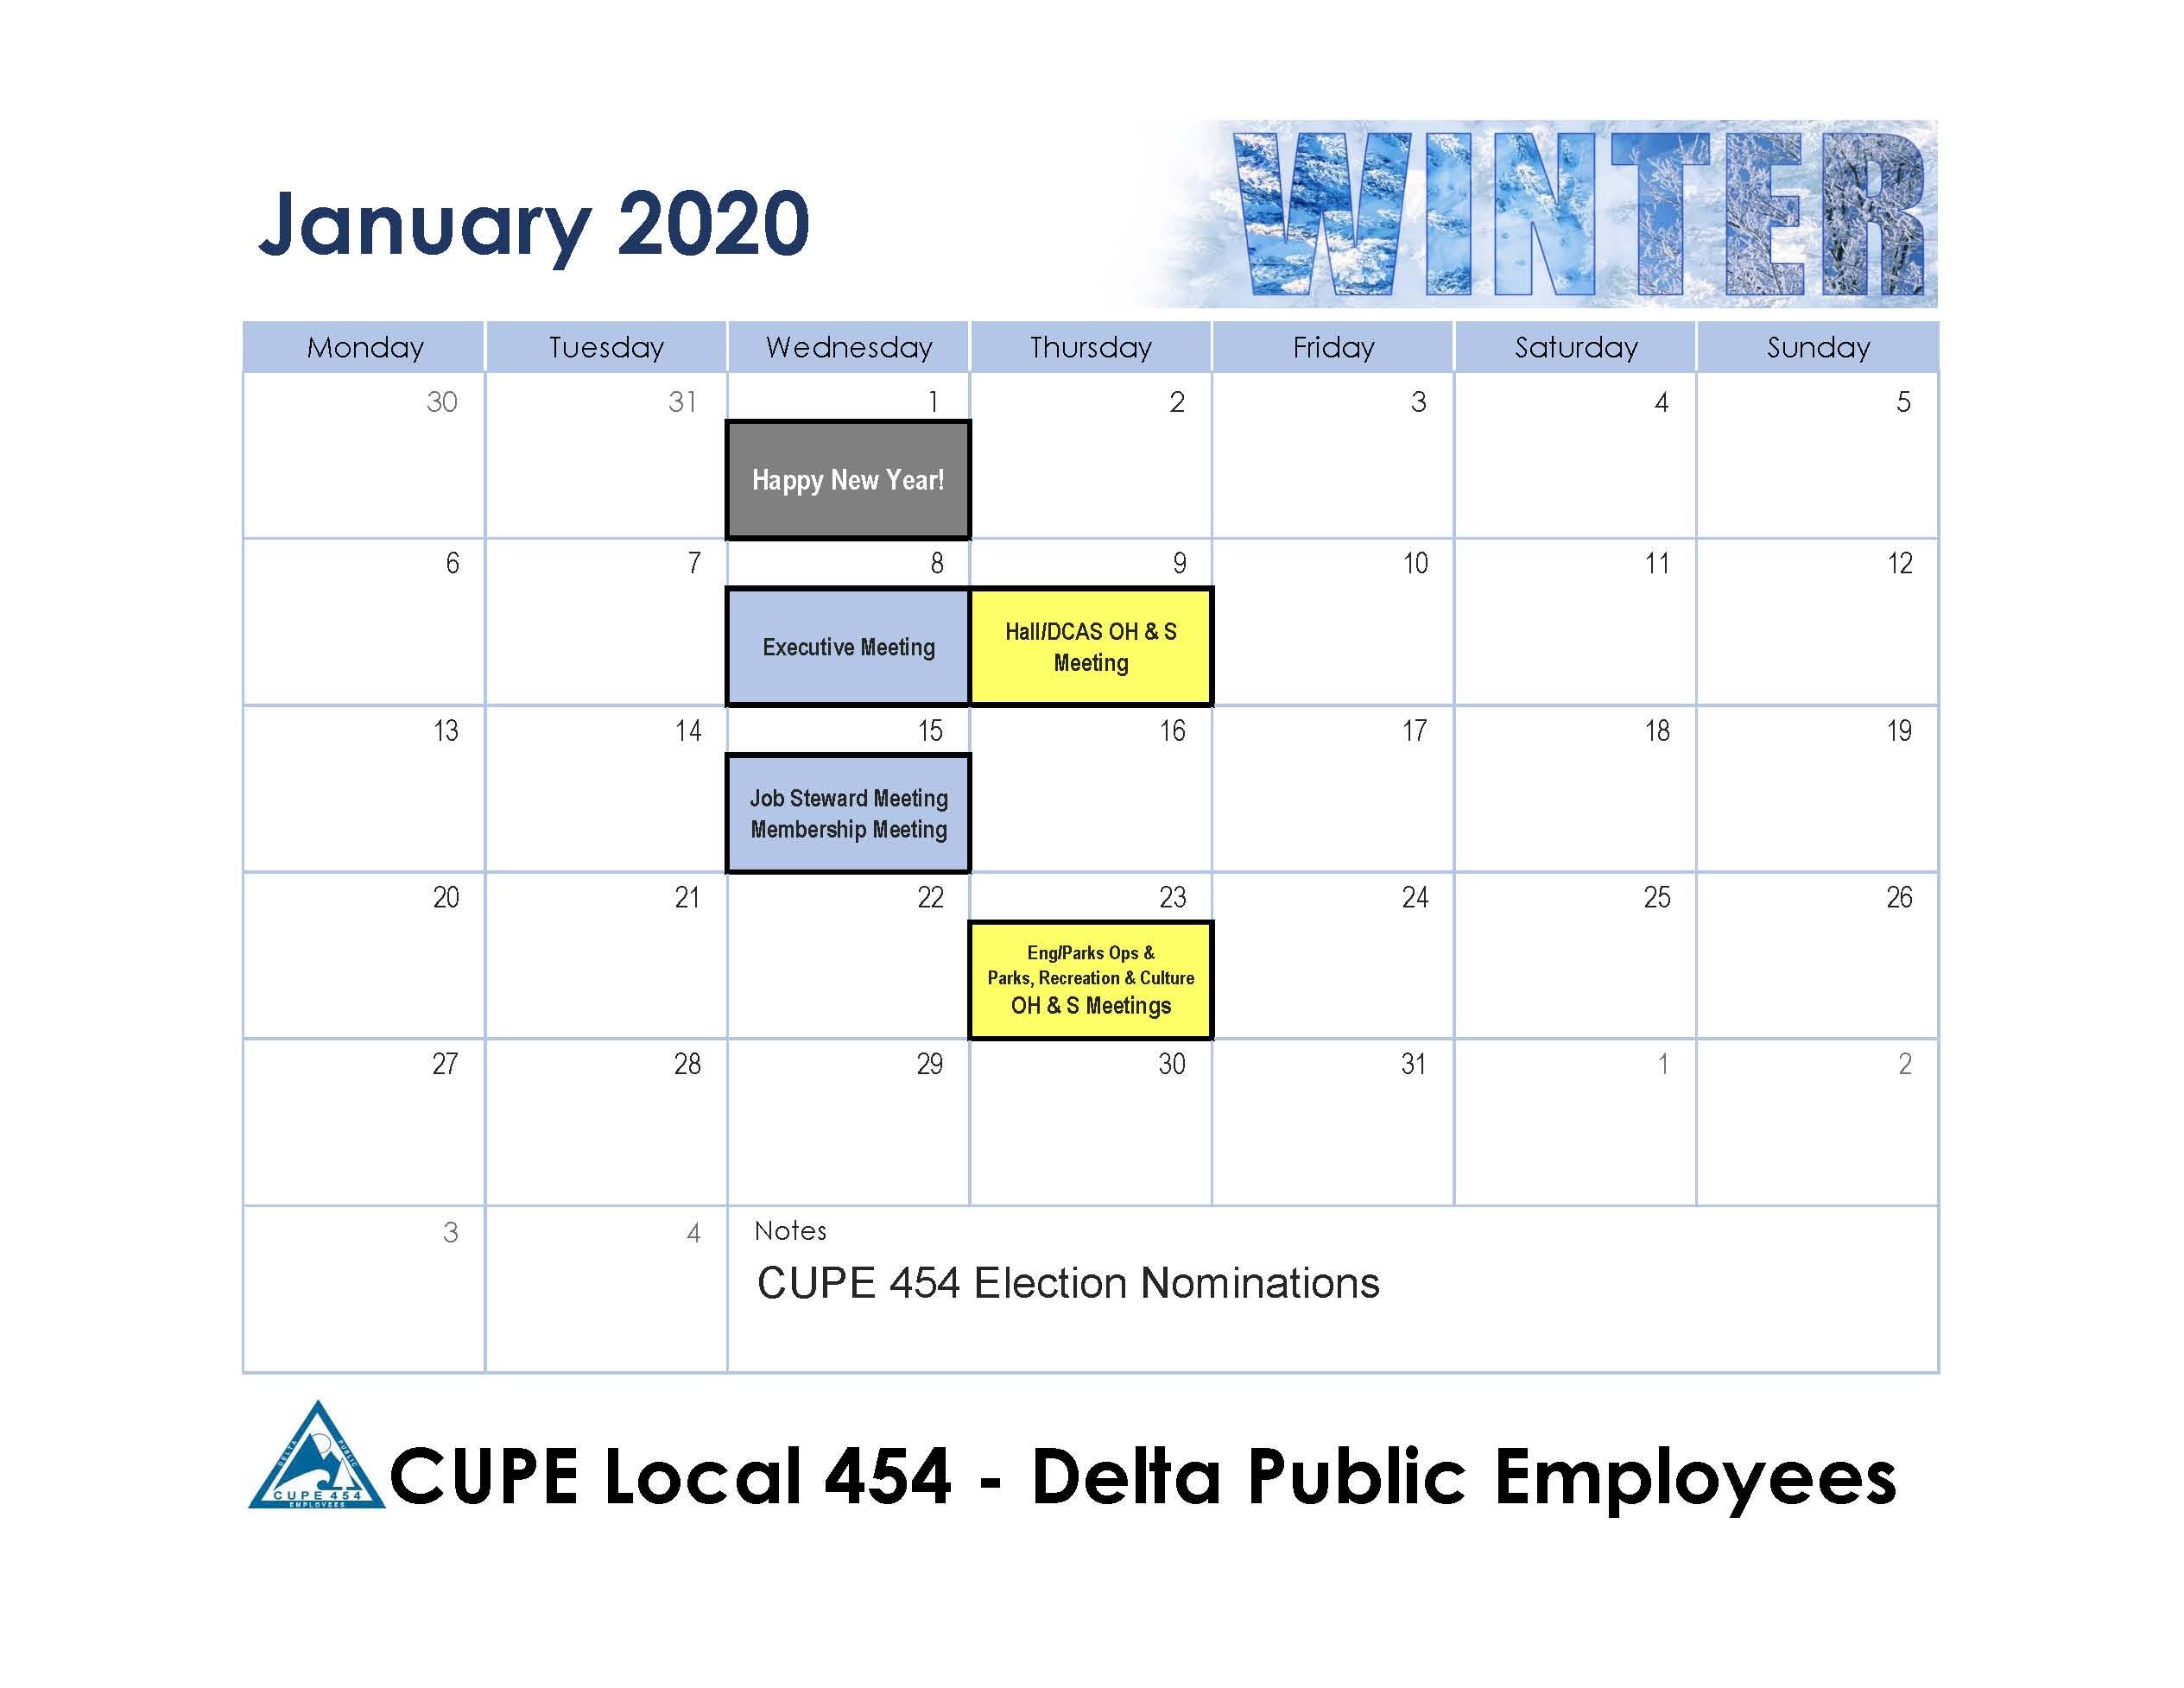 January 2020 Cupe 454 Calendar | Cupe 454 Inside 454 Calendar For 2020